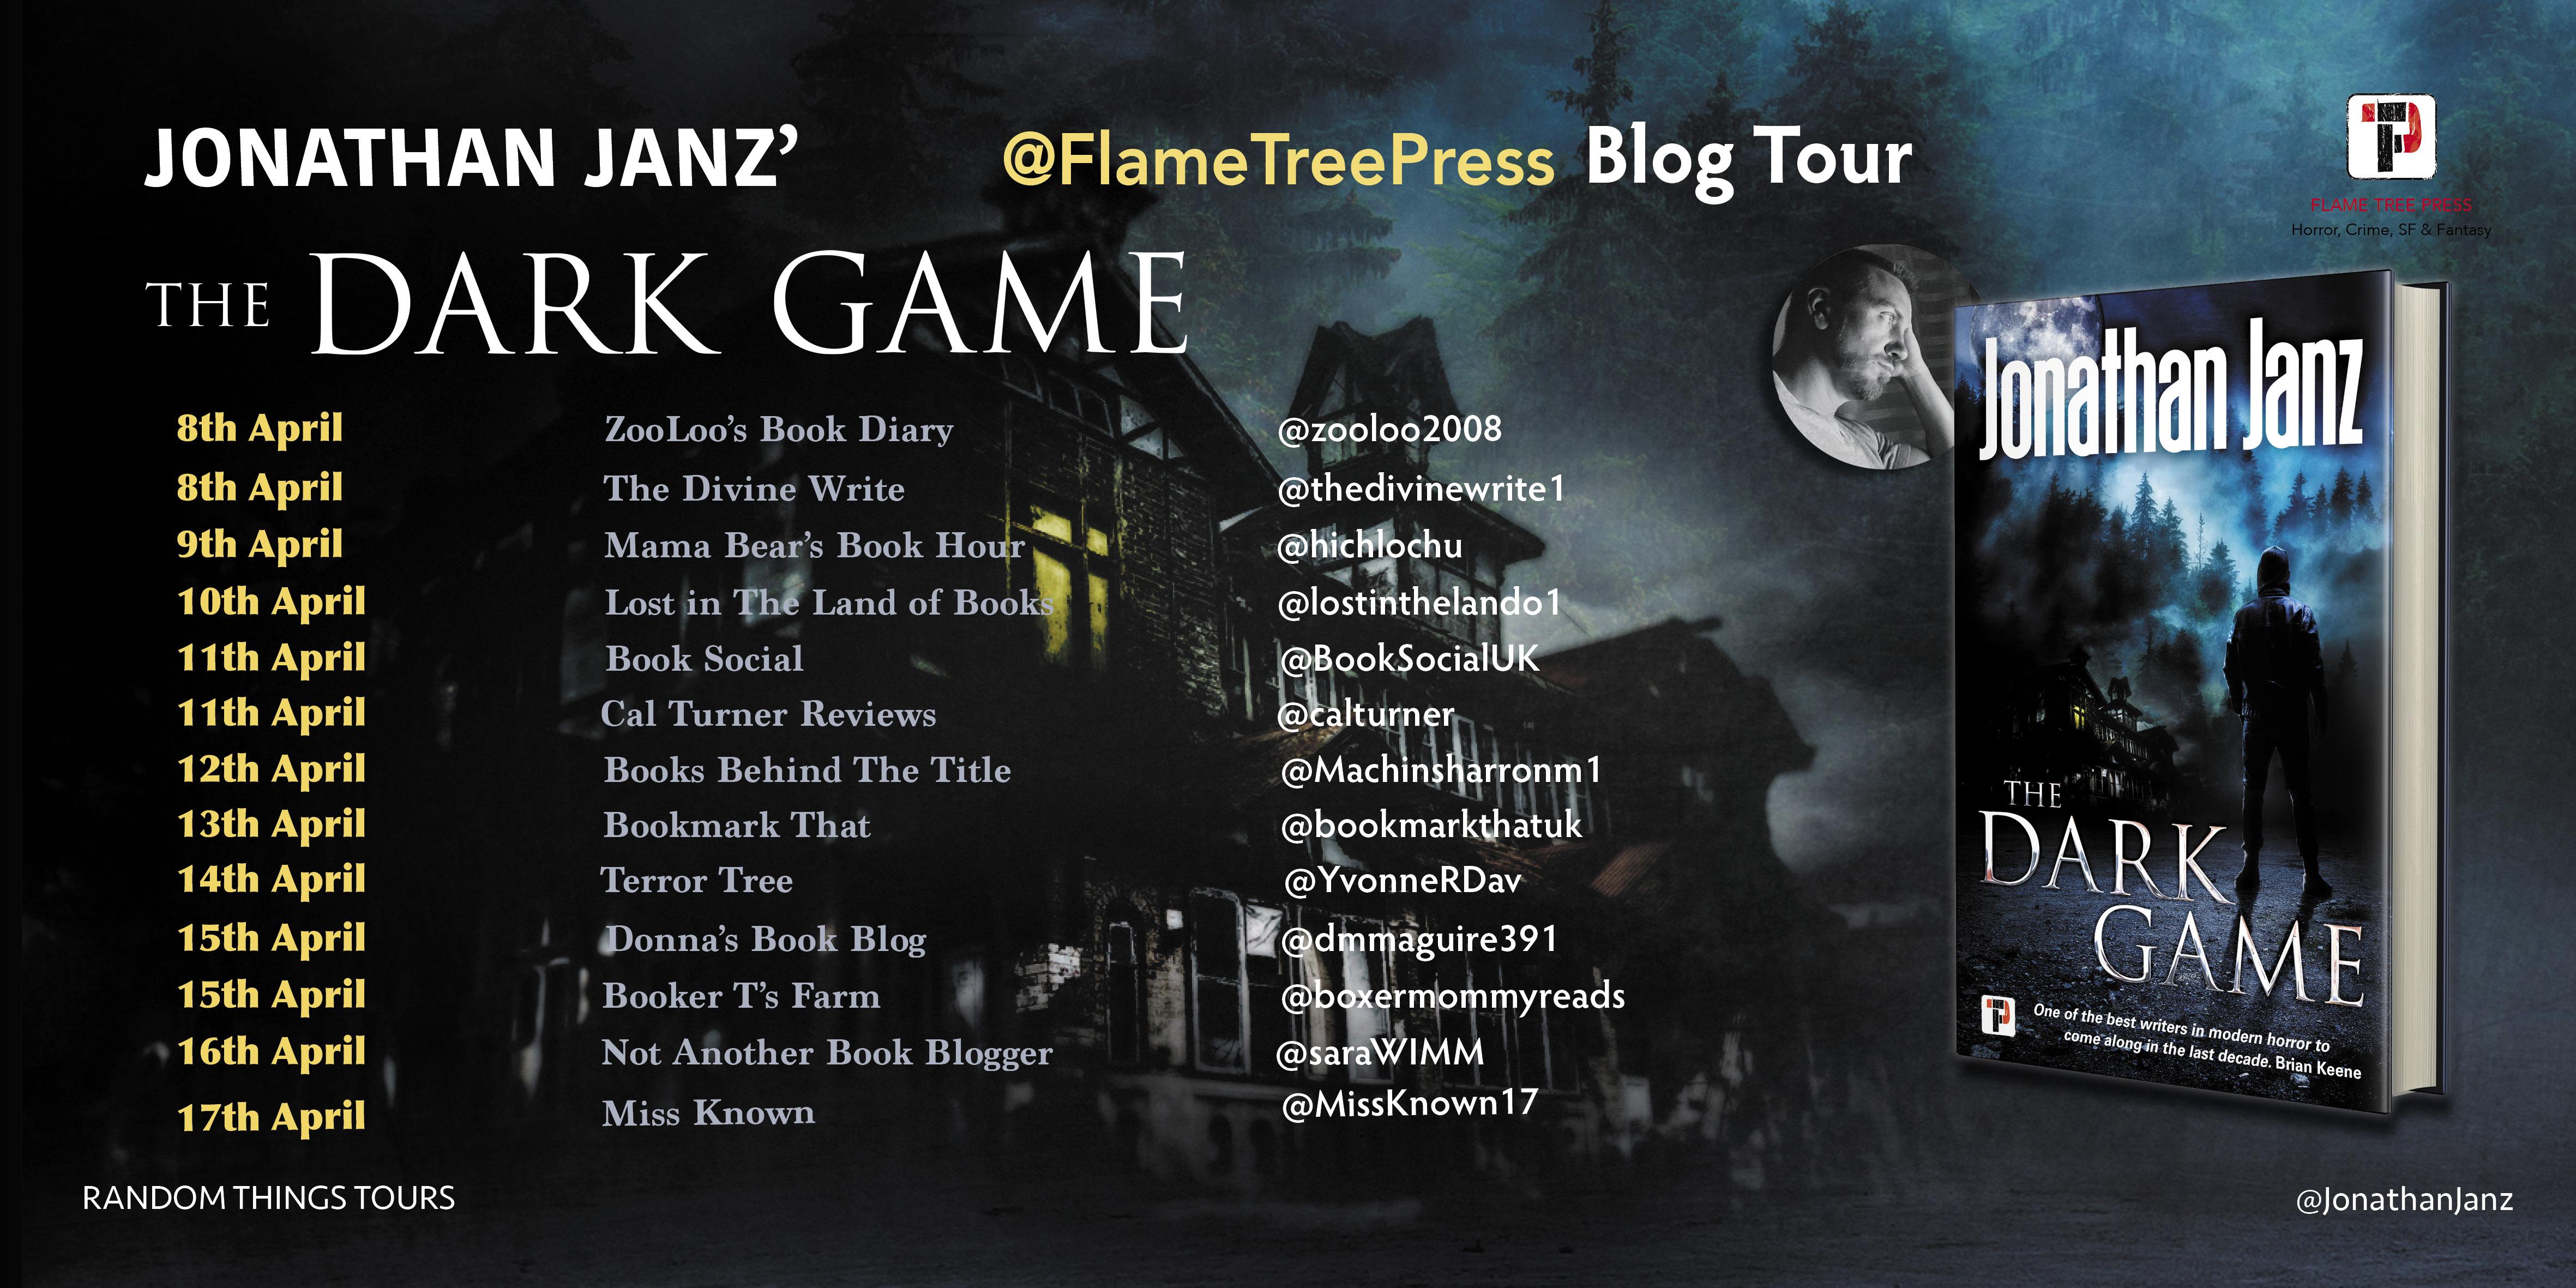 Jonathan Janz - The Dark Game Blog Tour